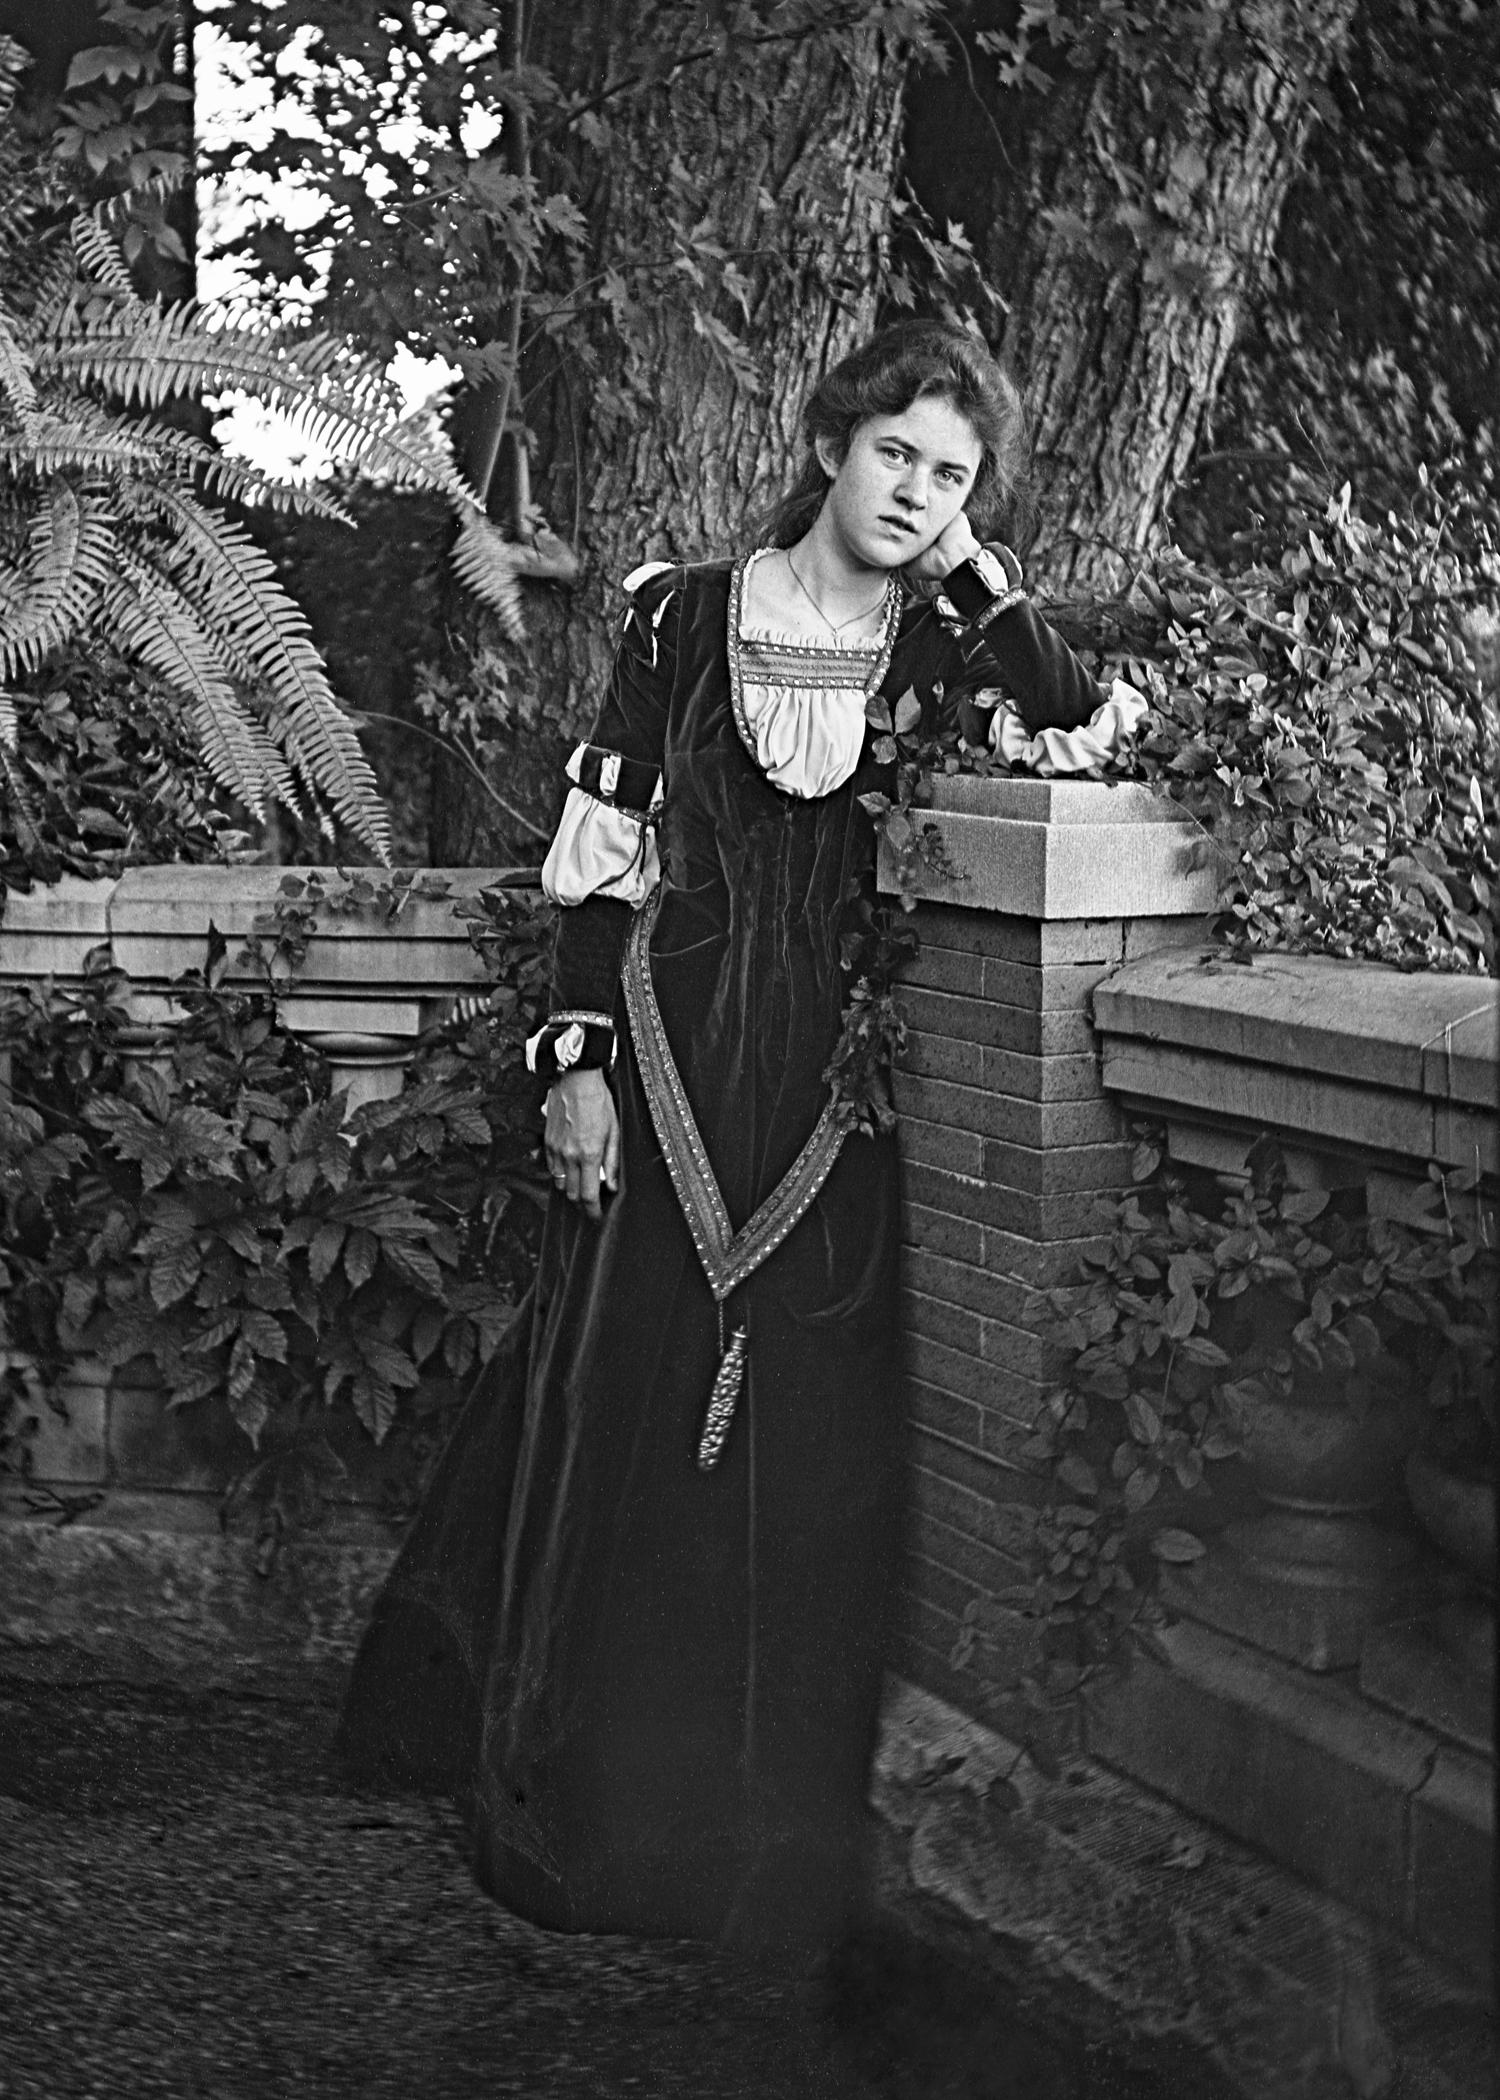 Figure 3: Mildred Glenn Pitcairn by the Cairnwood balustrade (c. 1910).